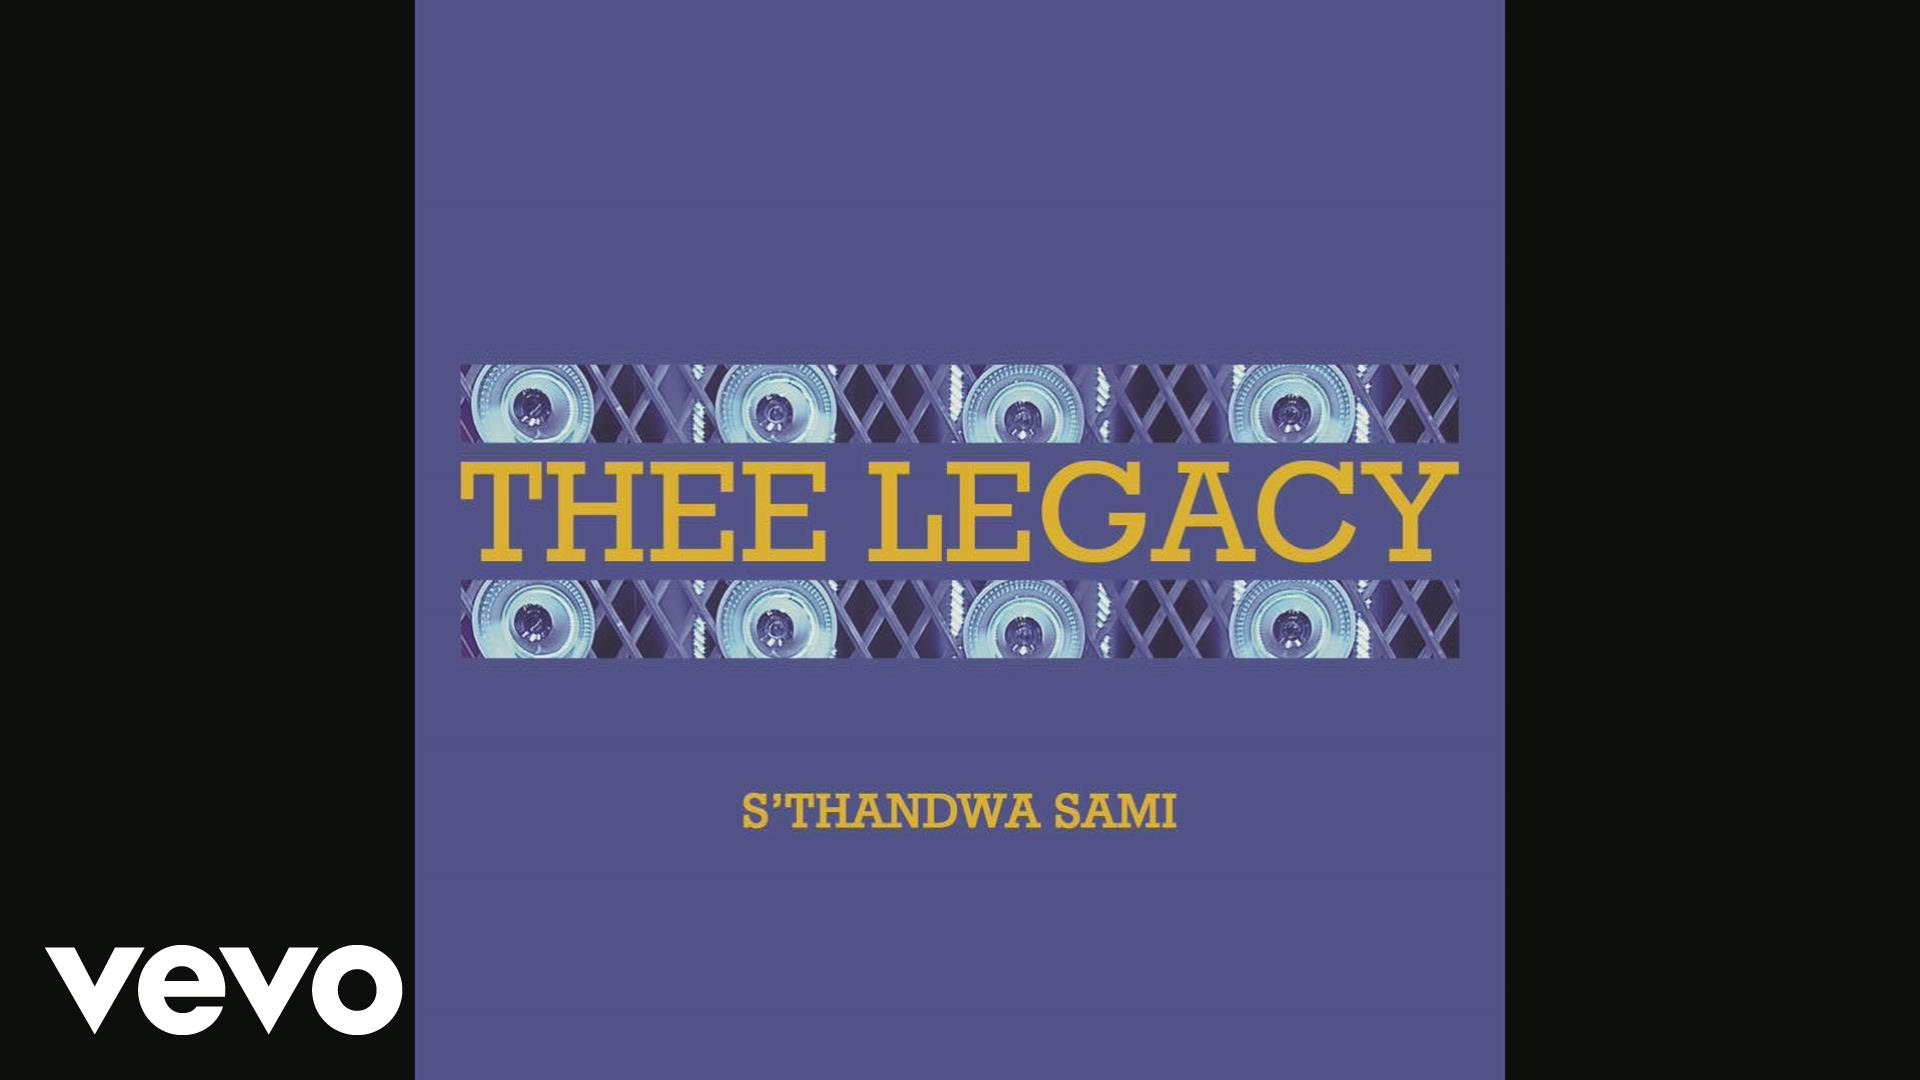 thee-legacy-sthandwa-sami-lyrics.jpg